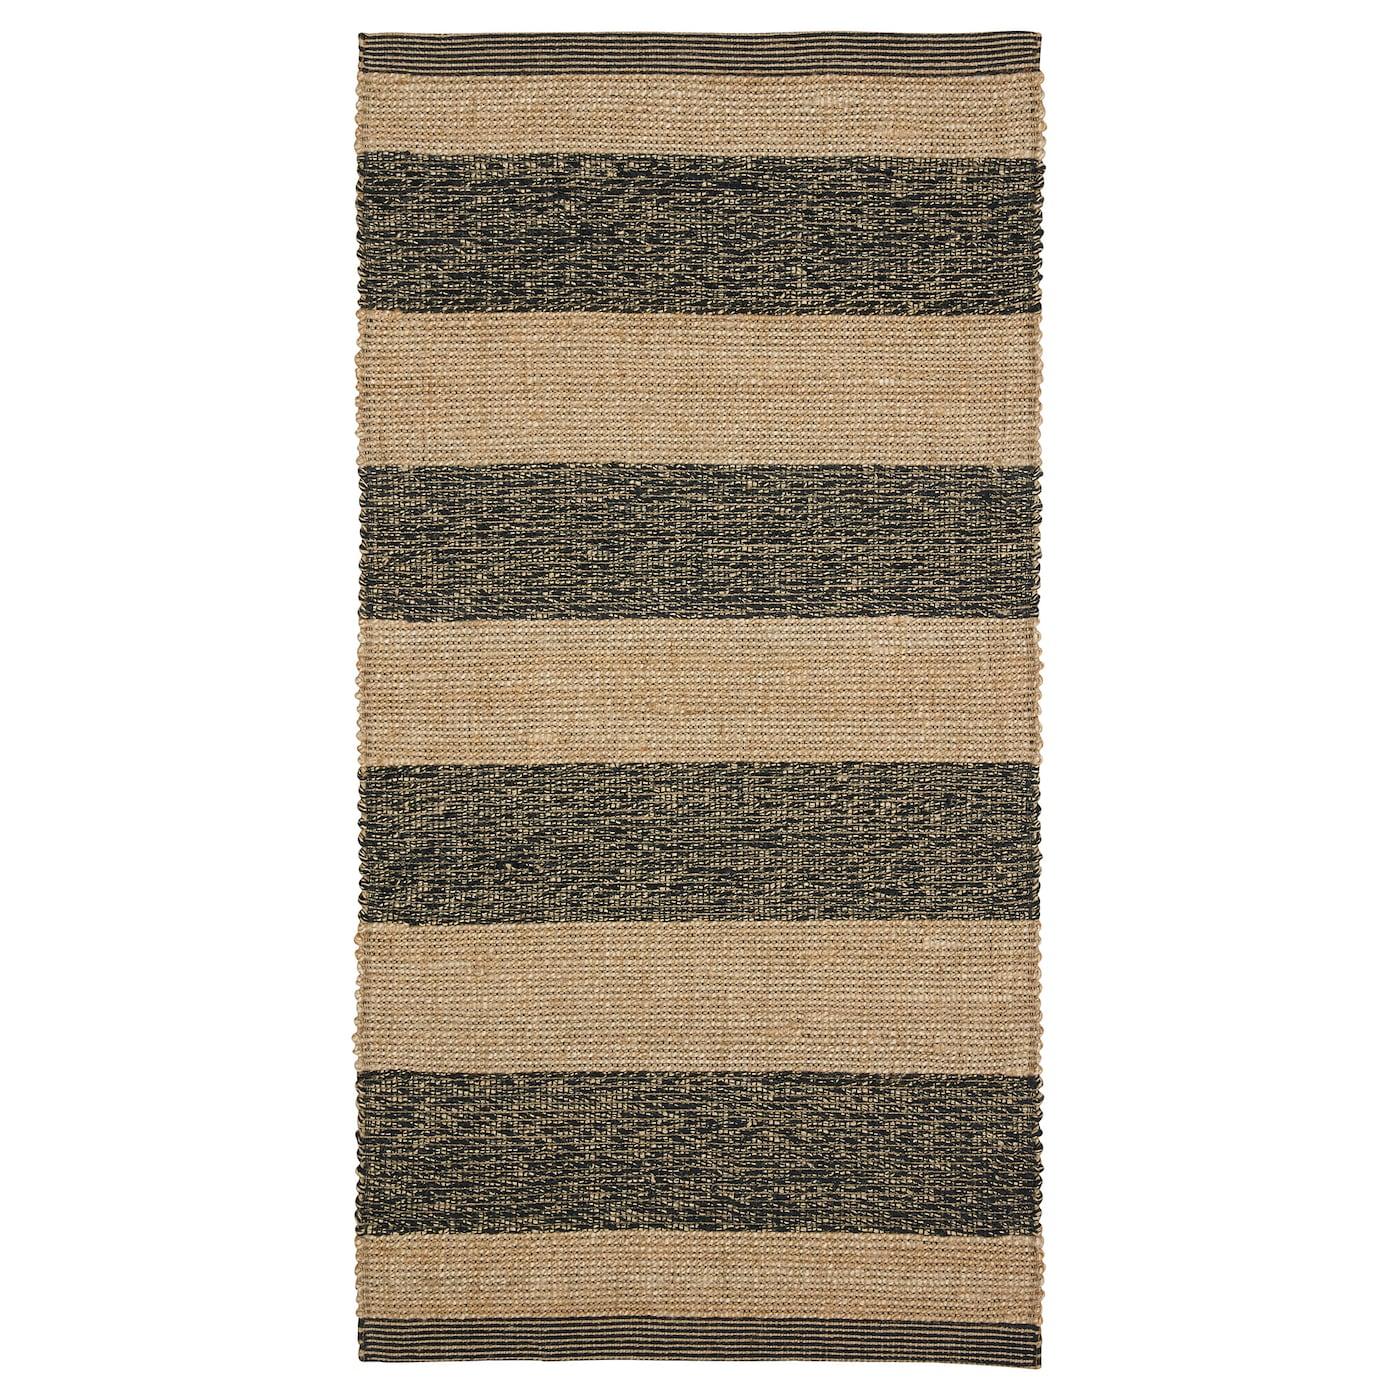 Ikea Lobbak Carpet: Ikea Rugs And Carpets Uk